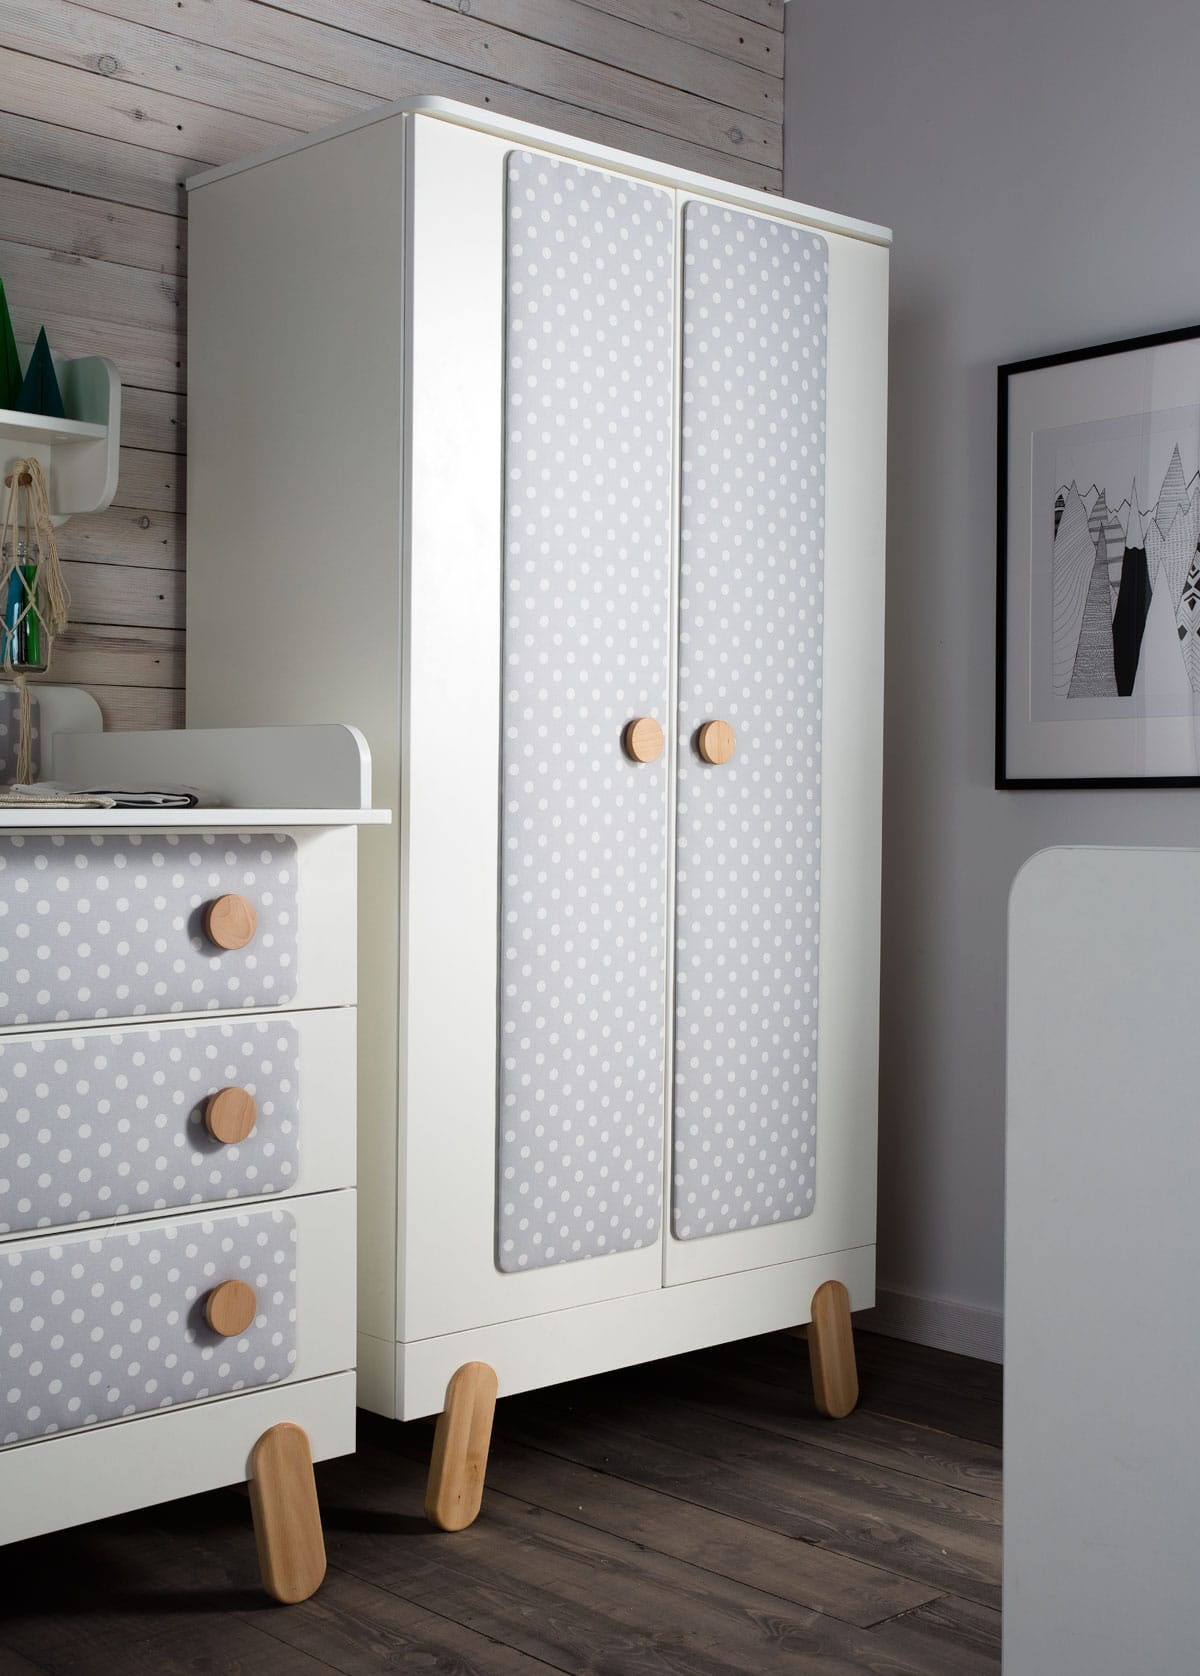 pinio iga textile 6 meubles lit 140x70 commode armoire 2 portes grande biblioth que. Black Bedroom Furniture Sets. Home Design Ideas